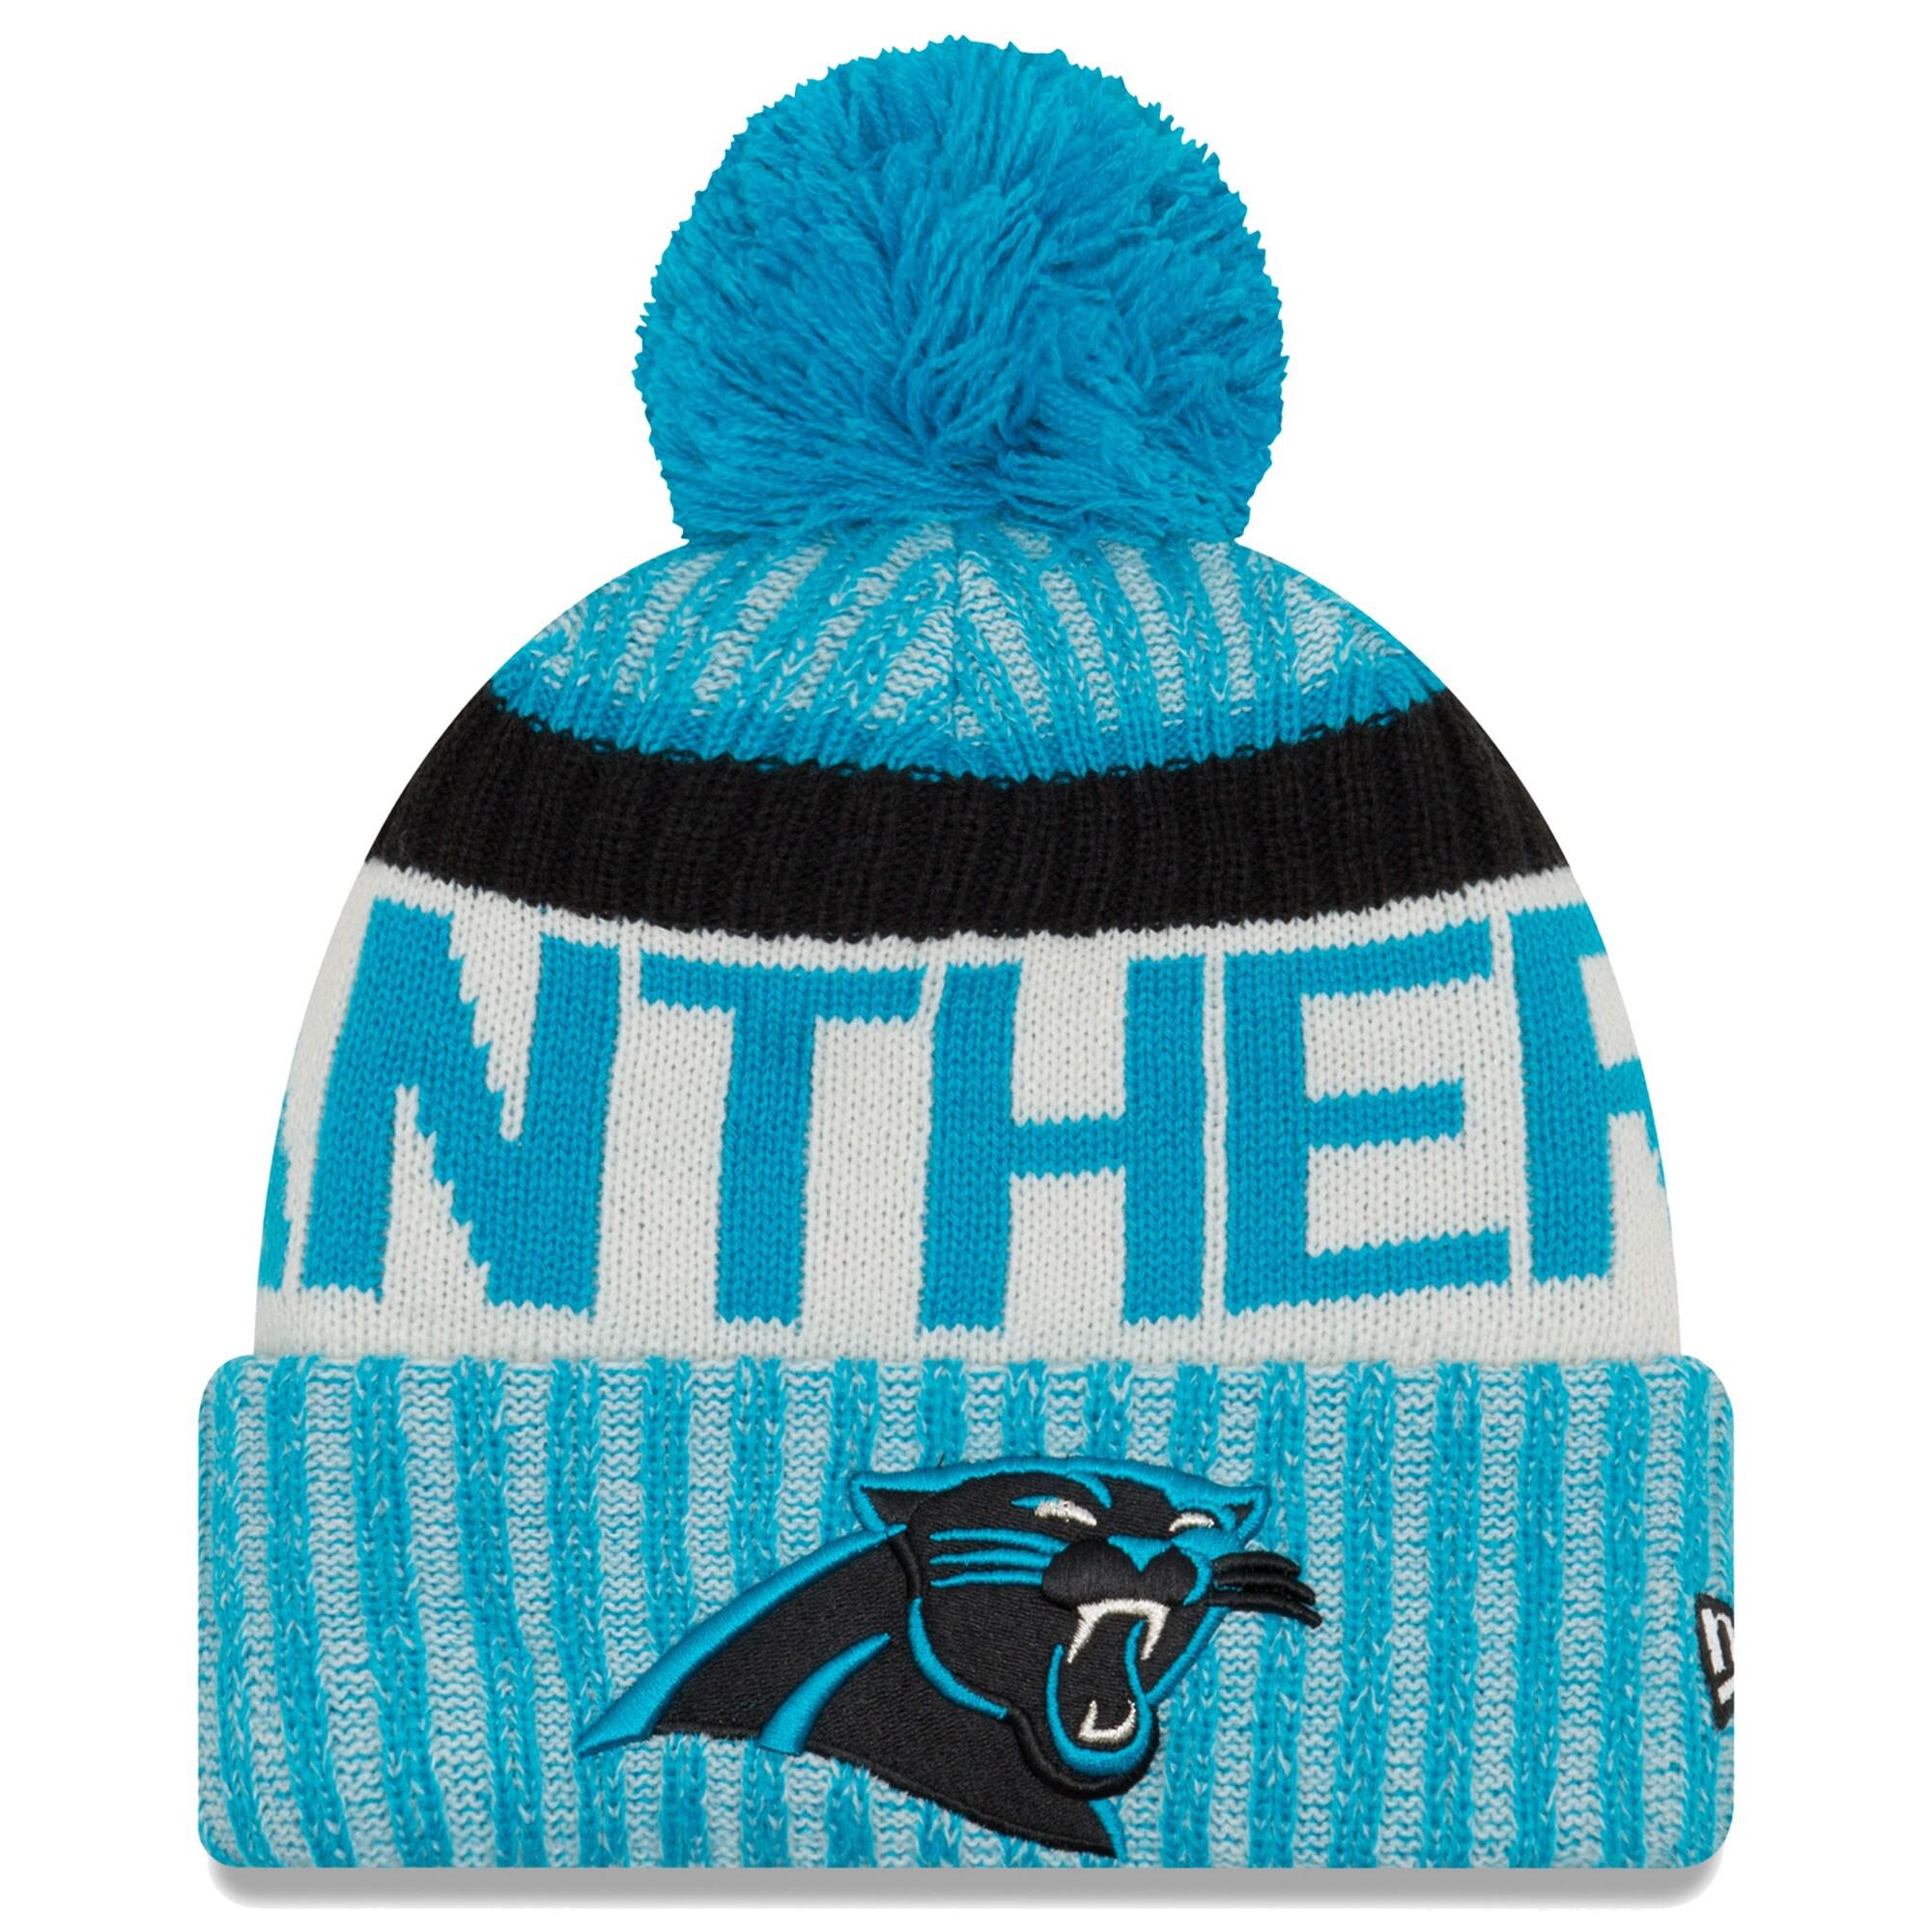 Carolina Panthers New Era 2017 Sideline Official Sport Knit Hat - Blue